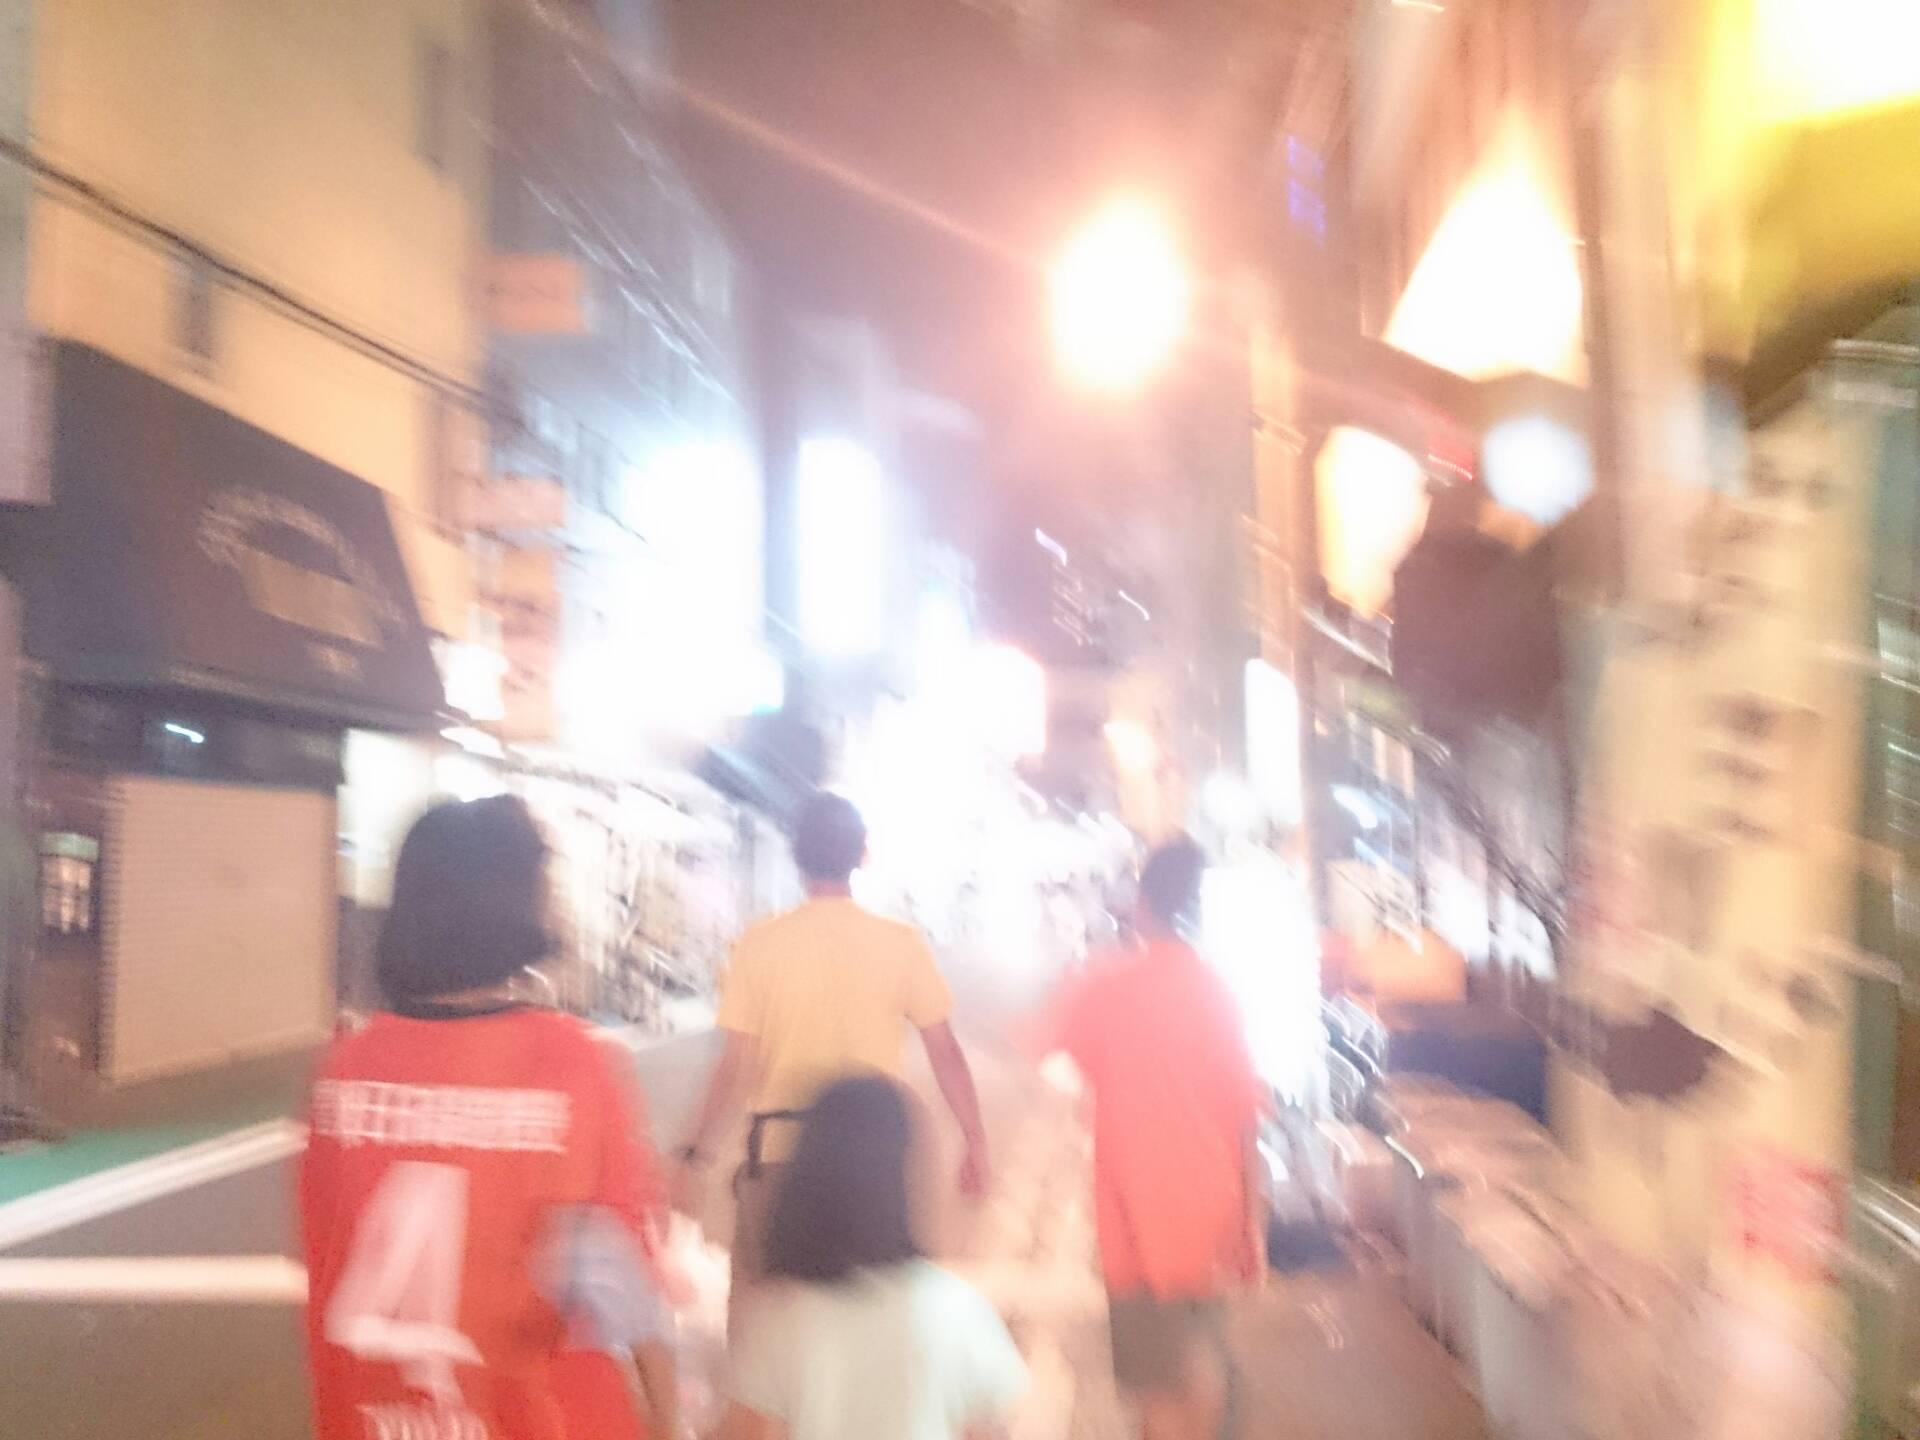 2014-08-16-22-01-50_photo.jpg